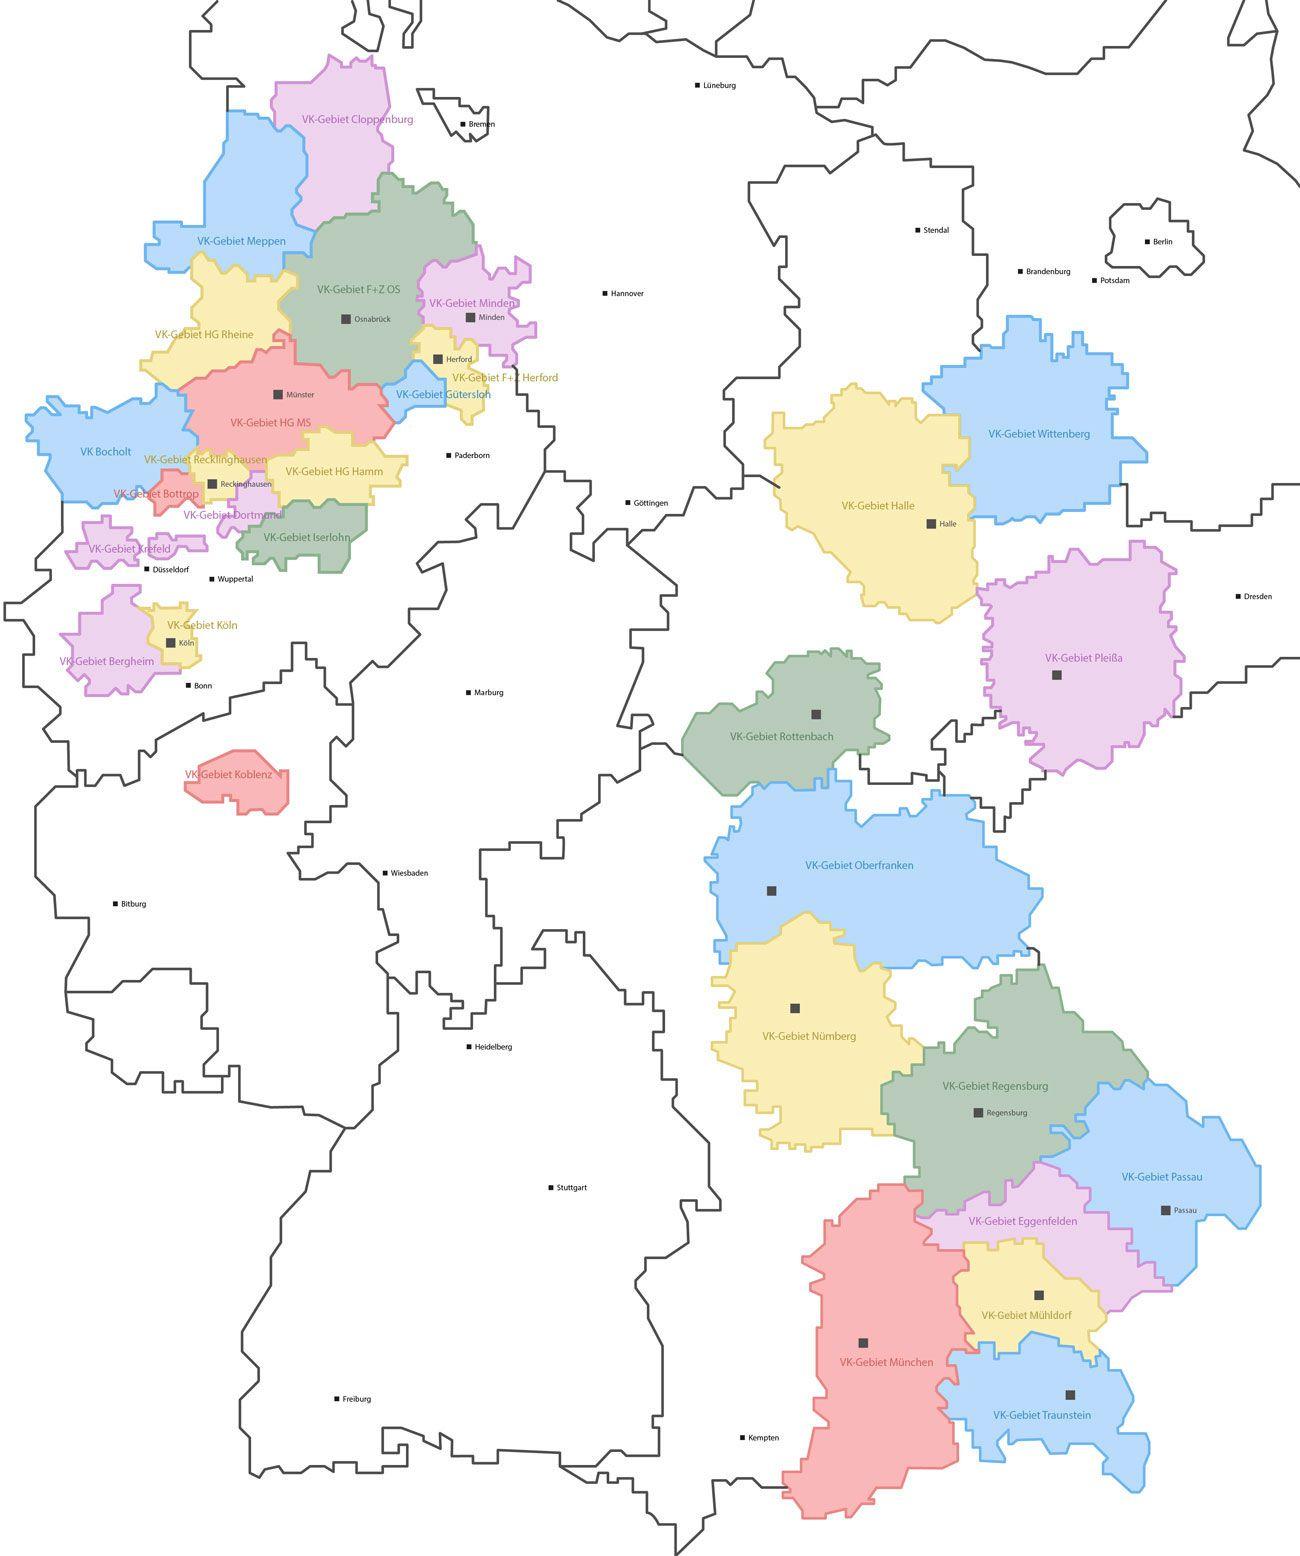 Unsere Gebiete H Gautzsch Bottrop B Denter Gmbh Co Kg